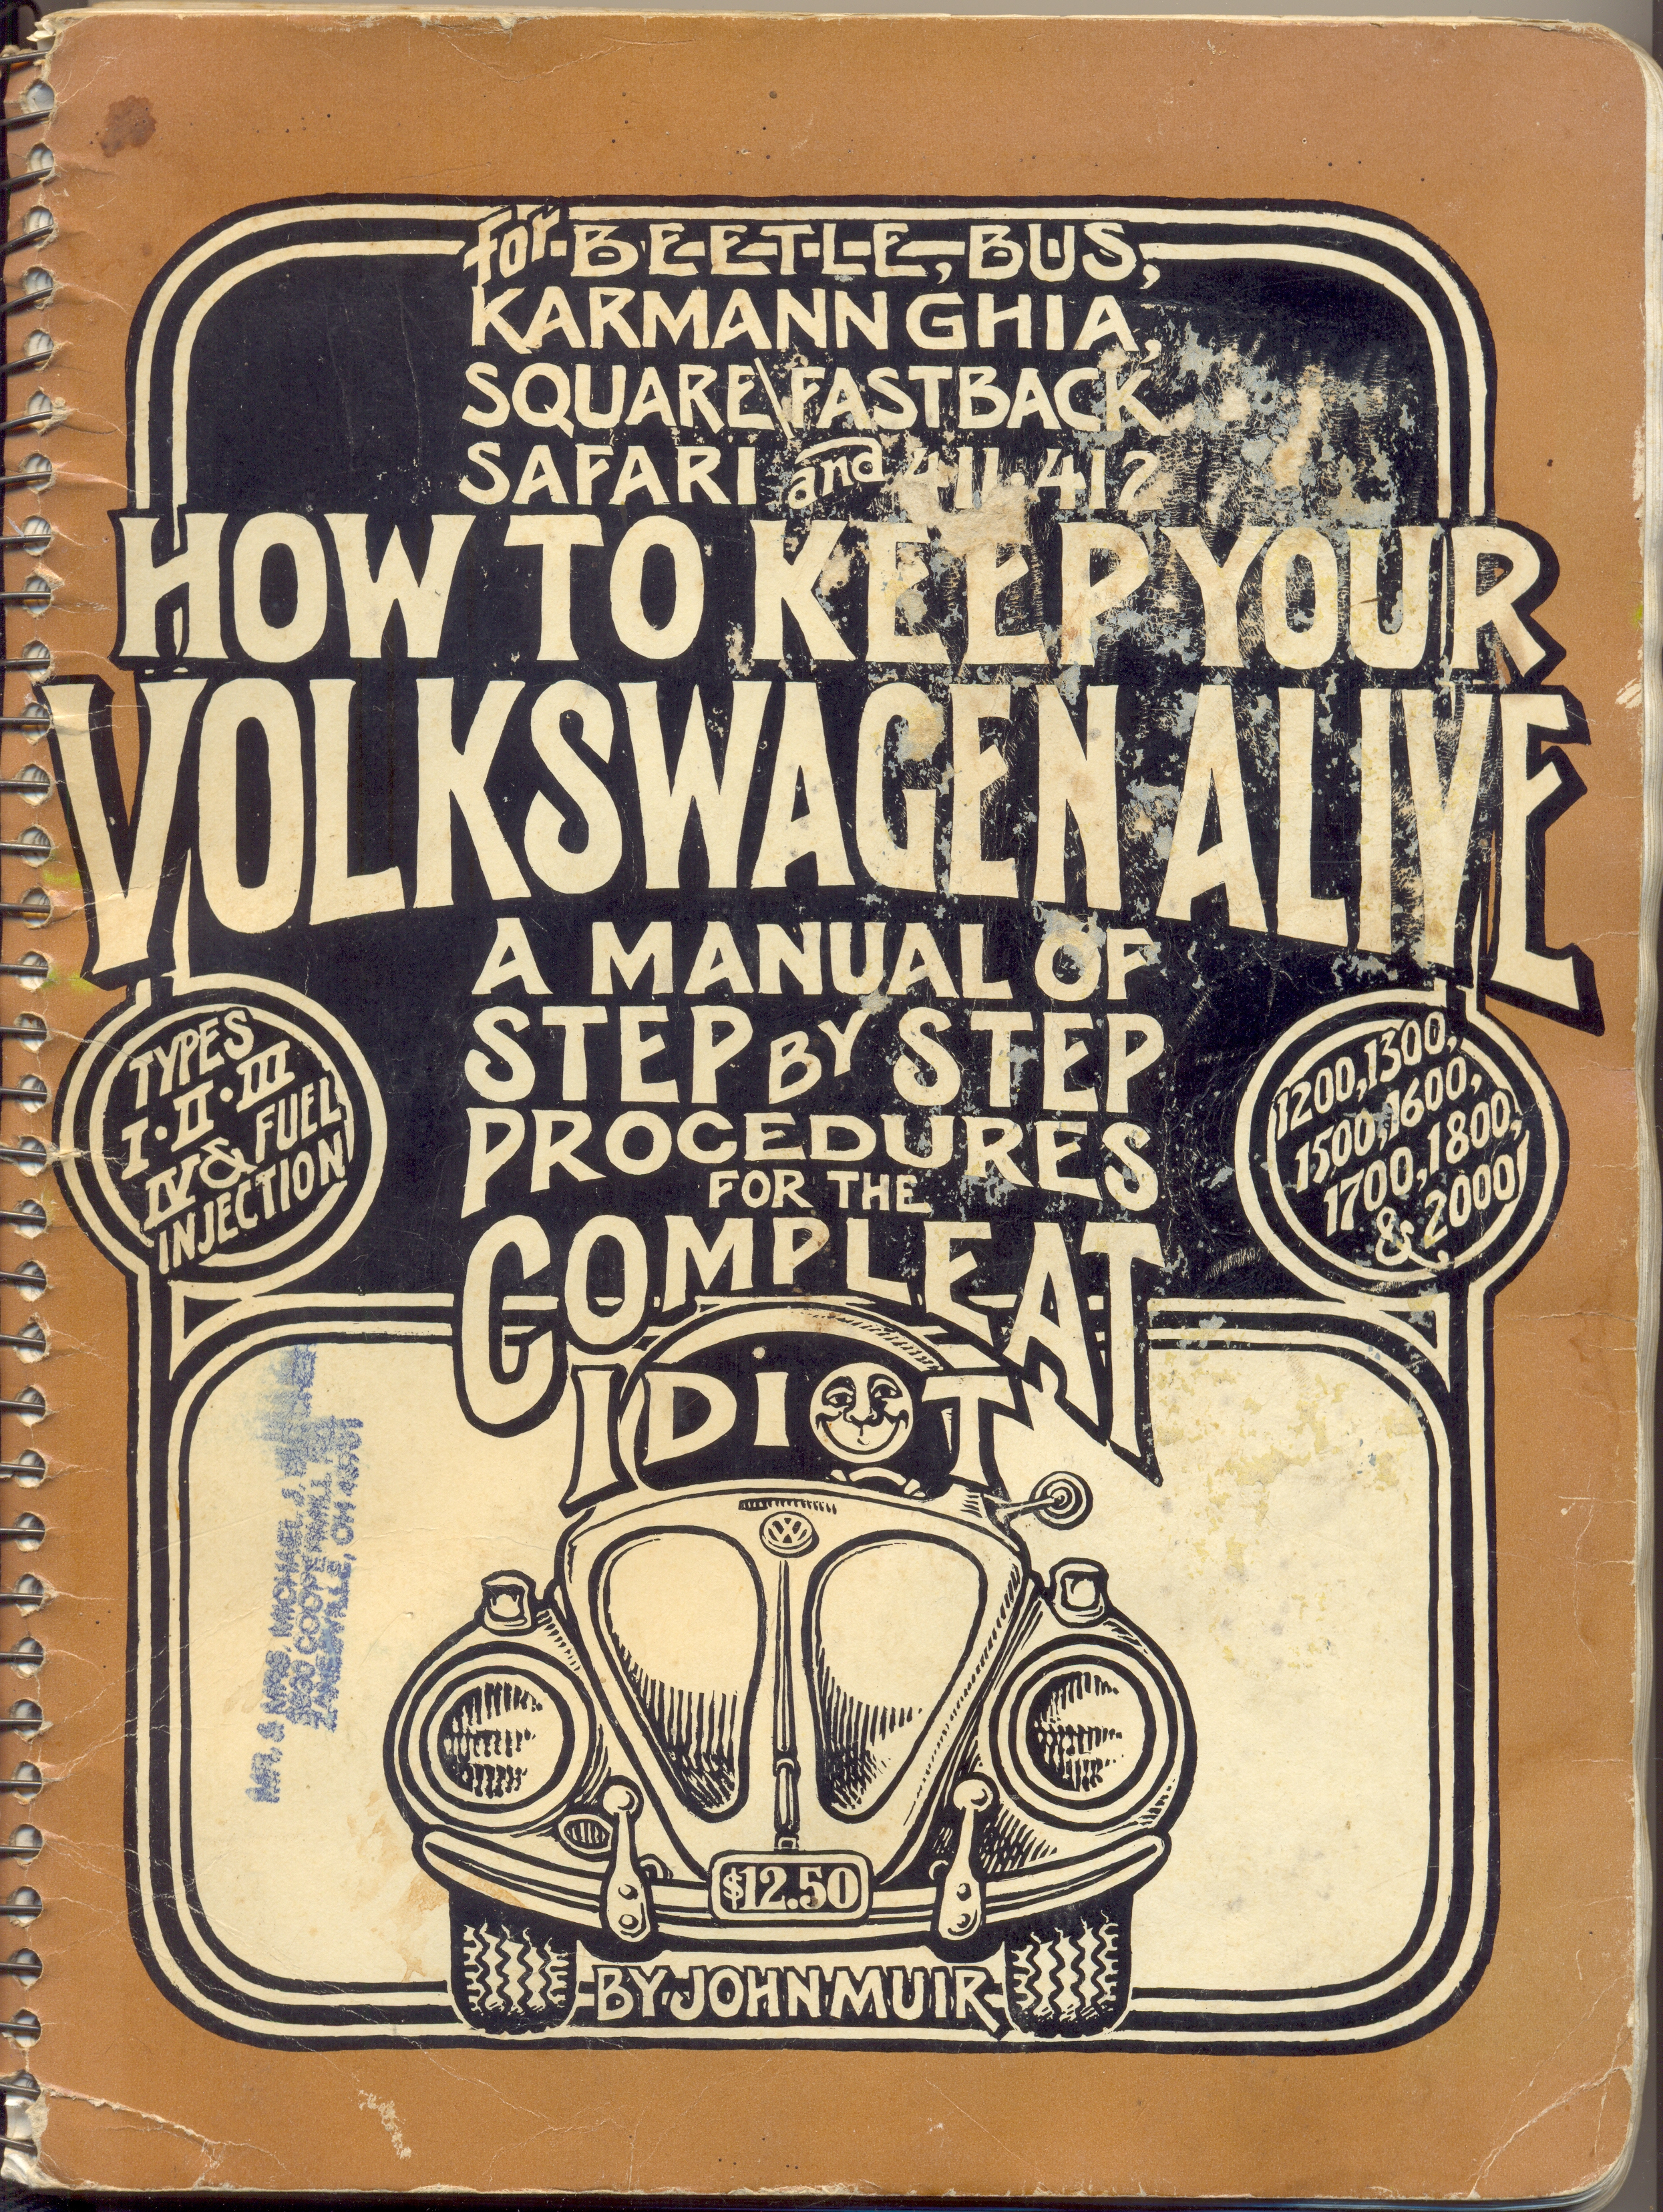 TheSamba.com :: VW Archives - General VW Books